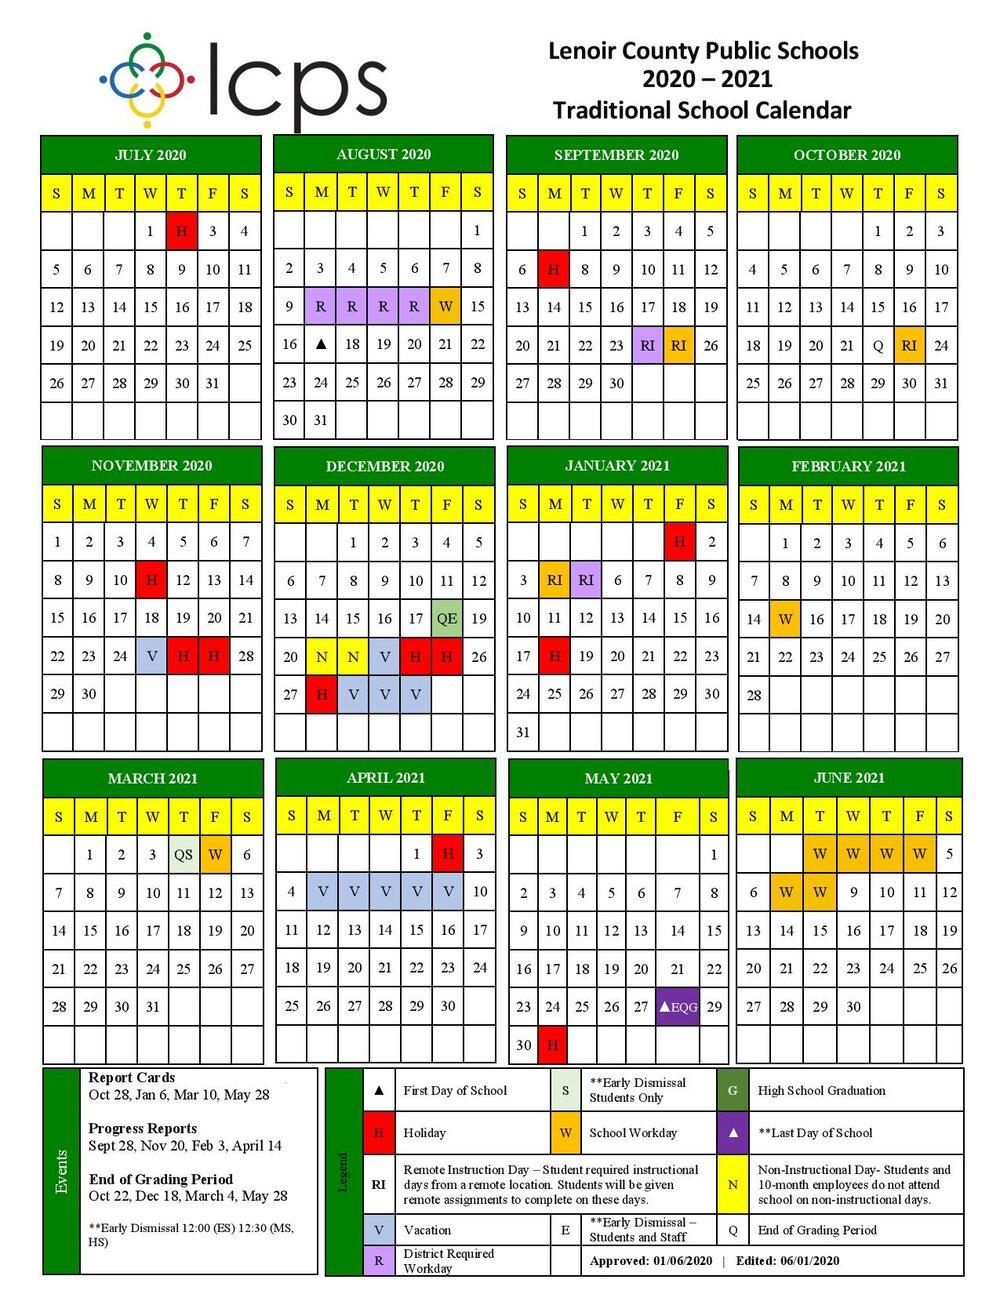 Lenoir County Public Schools Releases The Revised 2020 2021 For Lenoir County 2021 2021 School Calendar